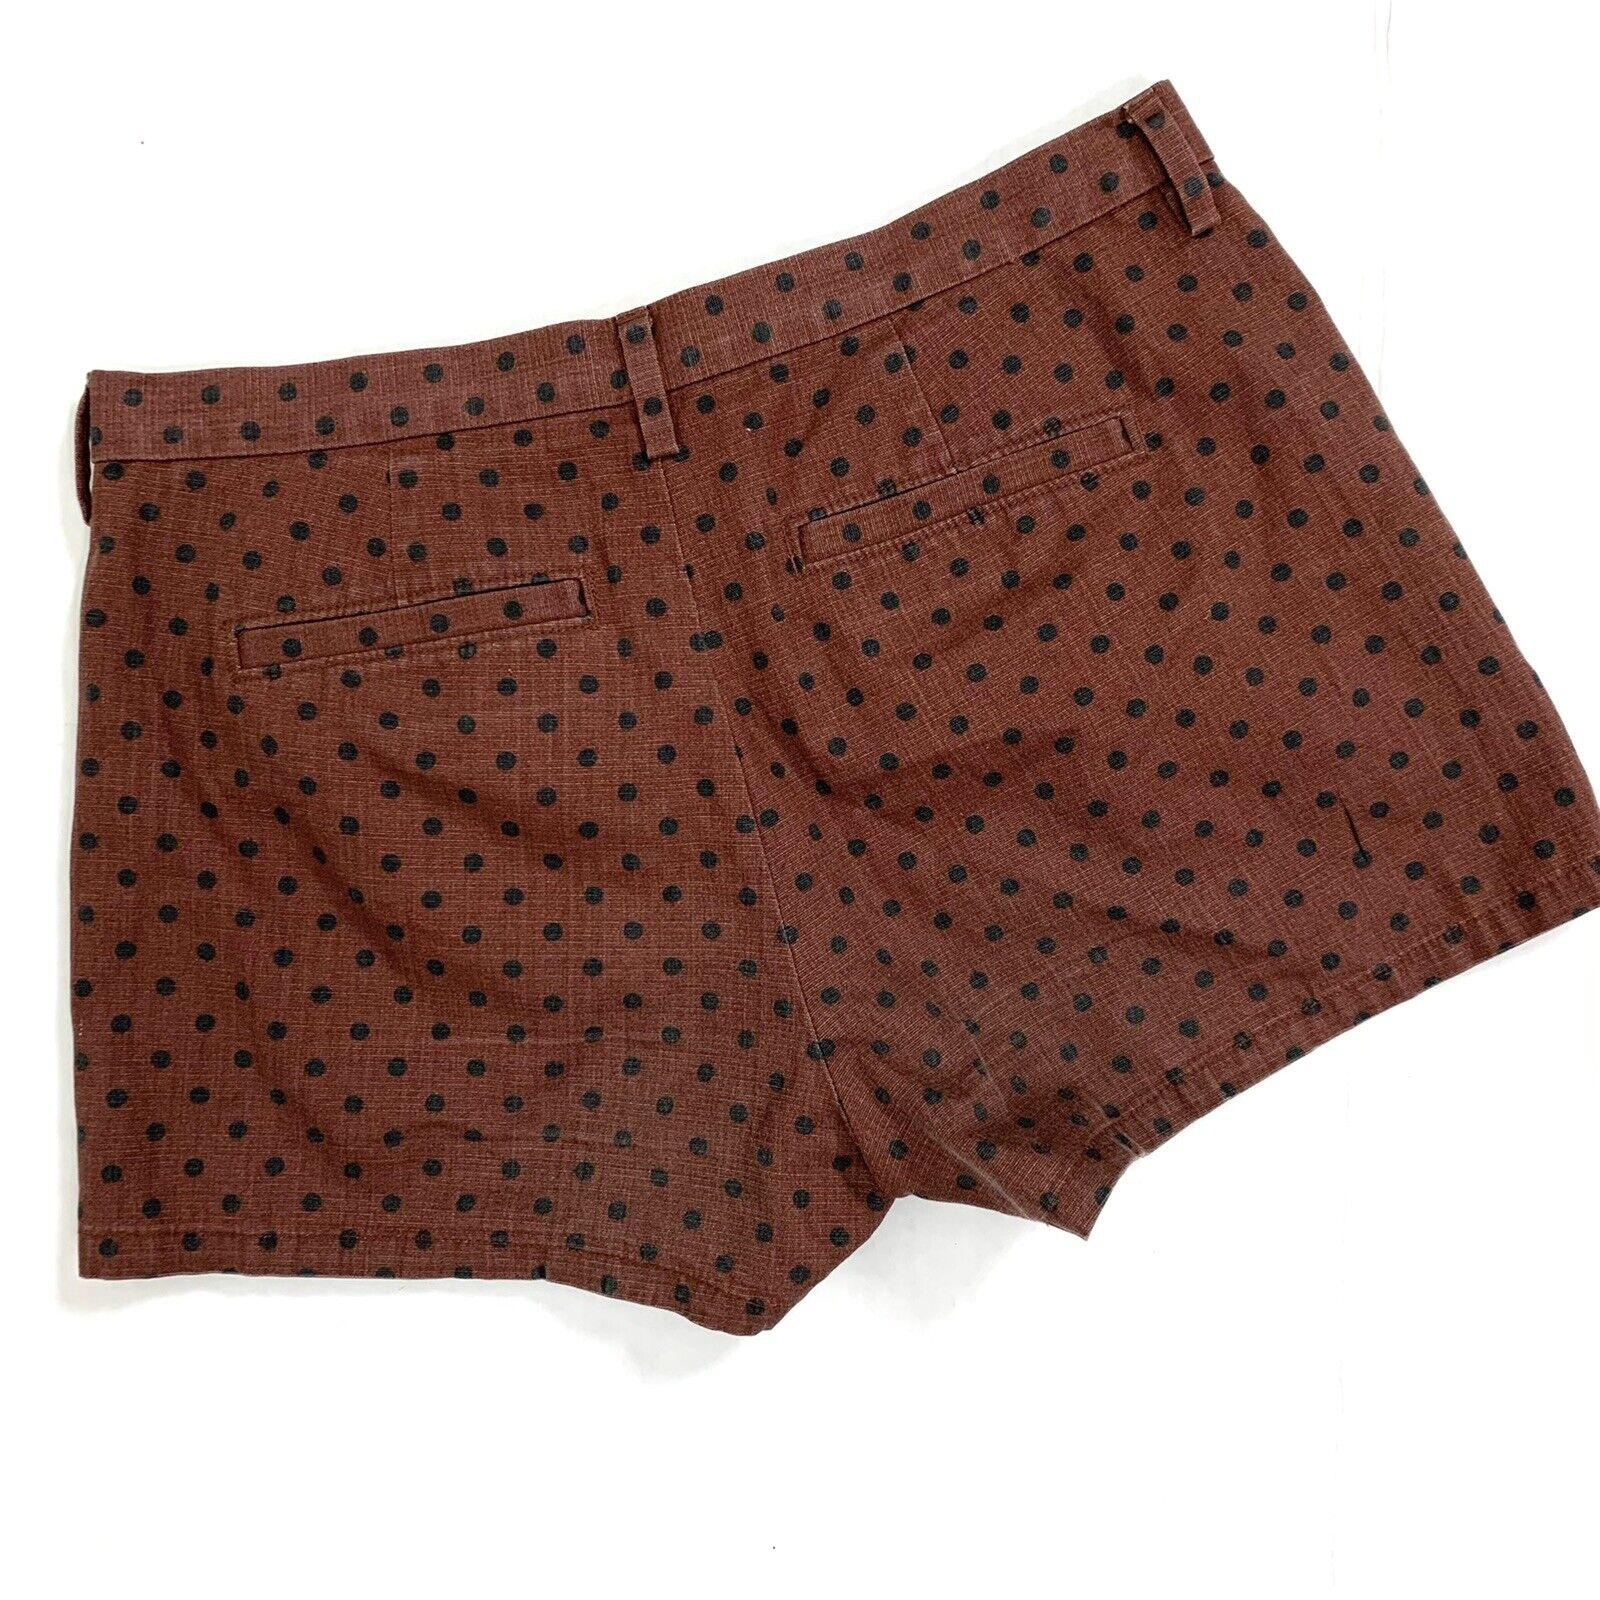 Madewell 01591 Brown Polka Dot Tailored Shorts 2 - image 3